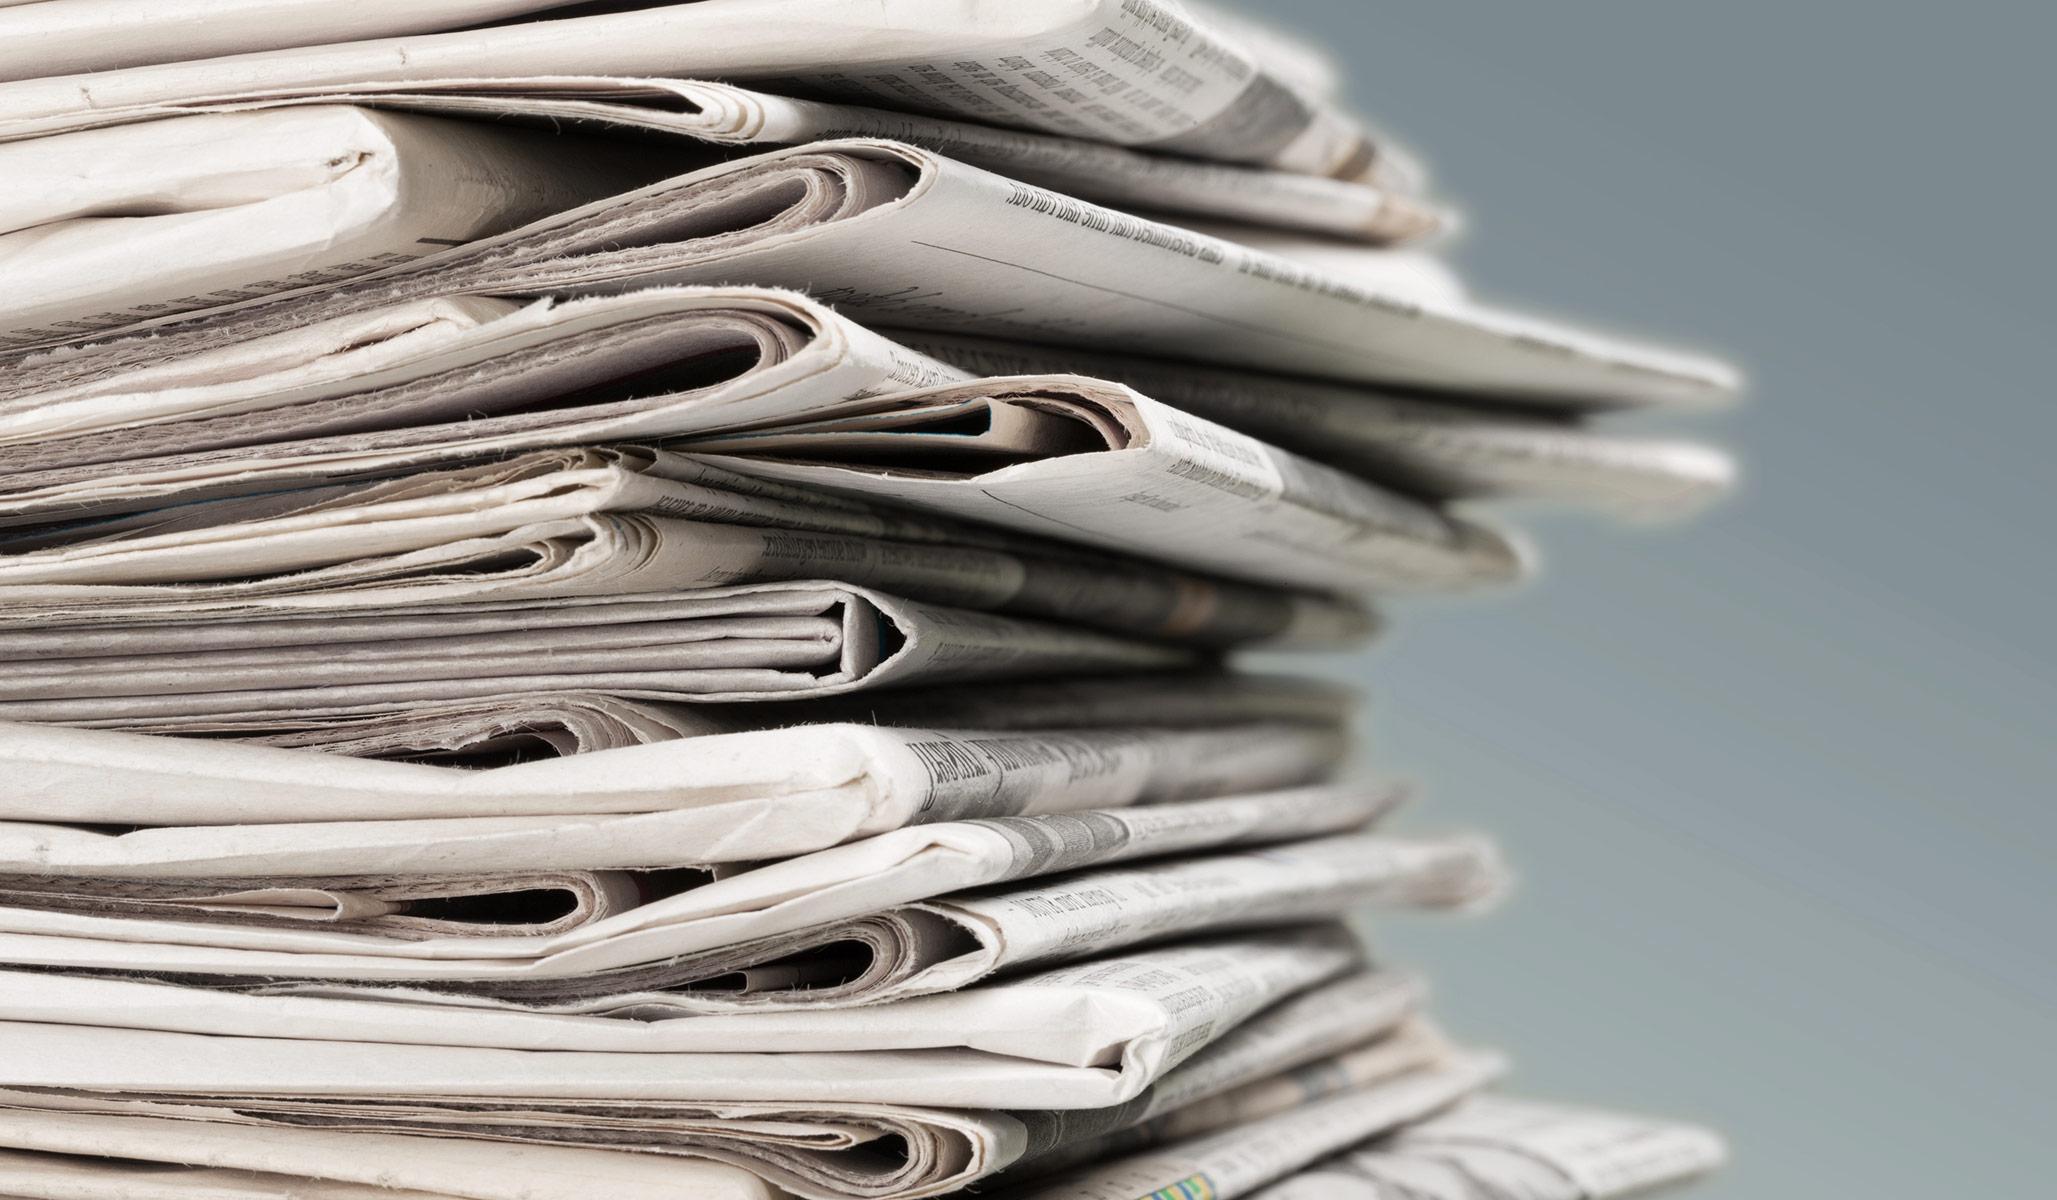 Local-News Woes Hide a Deeper Civics Problem